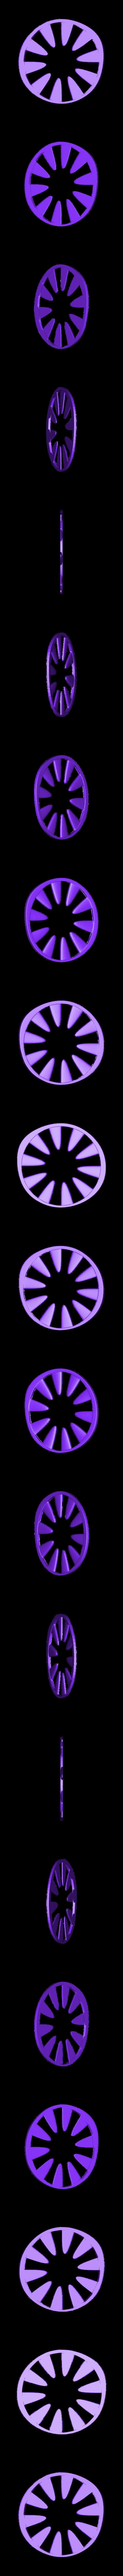 lep1_right.STL Download STL file Futuristic aircraft DIY 3d model • 3D printer object, NewCraft3D